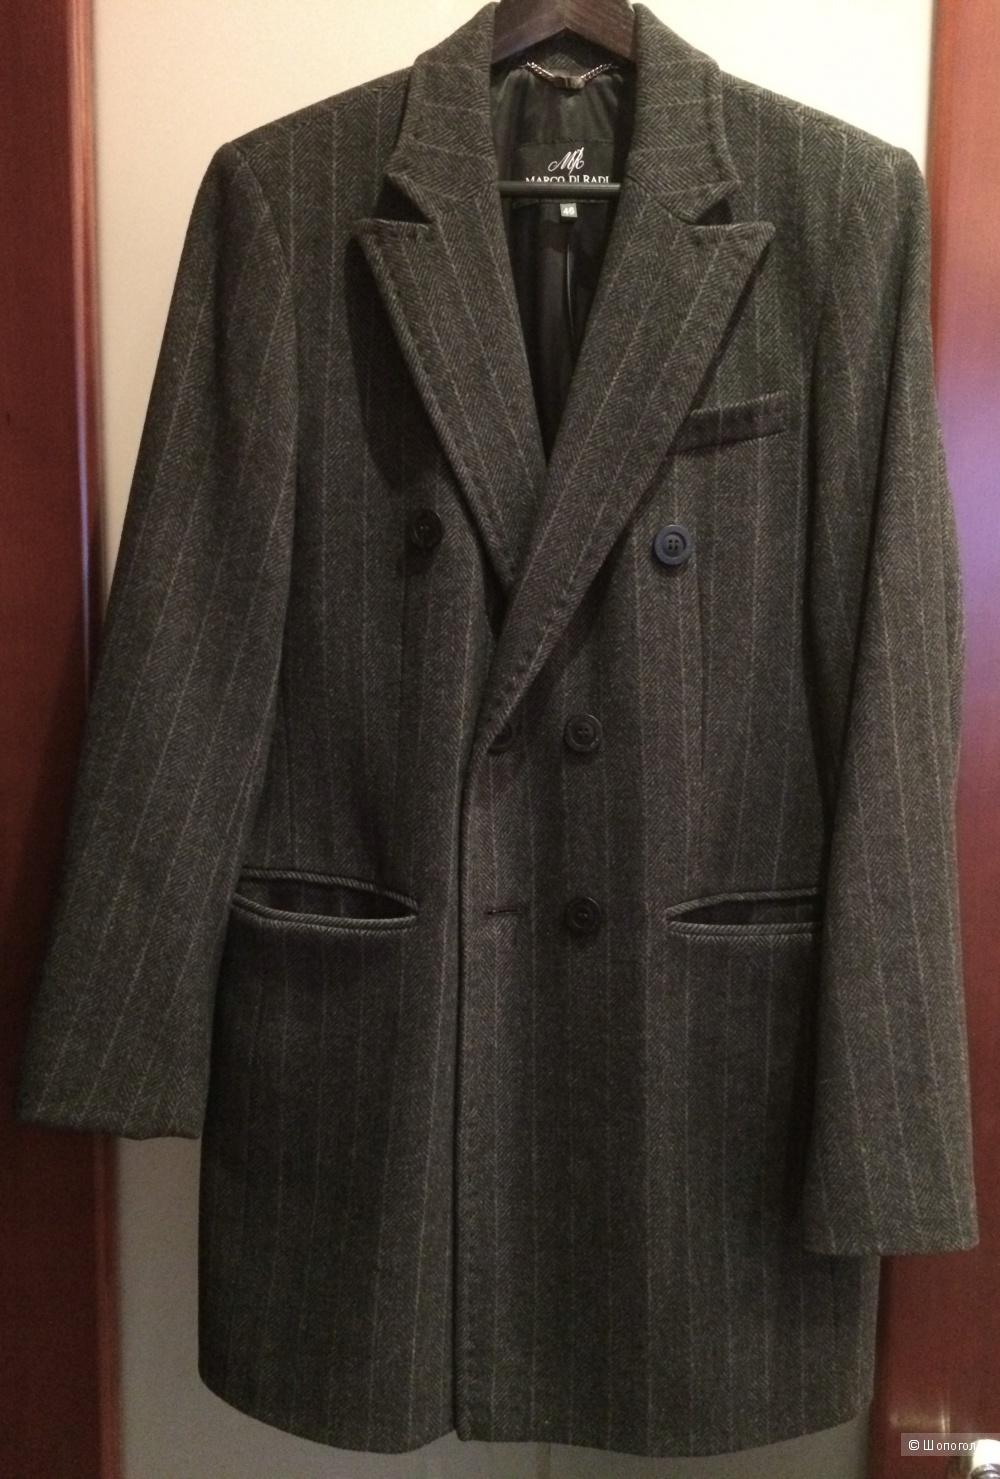 Пальто, Marco di Radi, размер 46/48